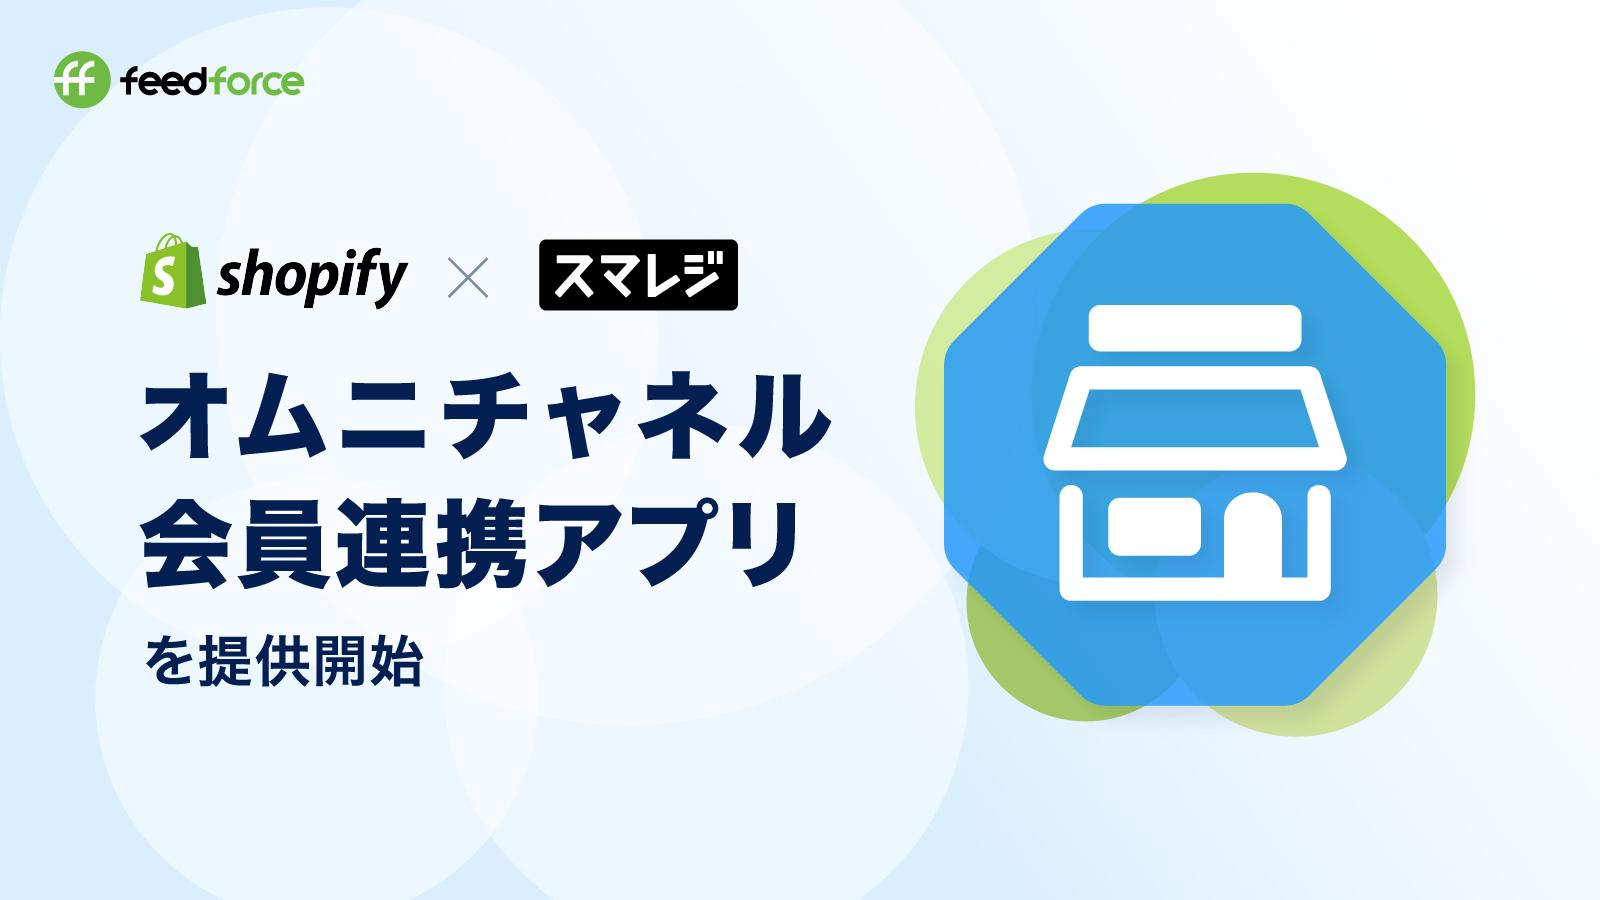 Shopifyとスマレジ間で会員情報を連携するオムニチャネルアプリ「Omni Hub」を提供開始